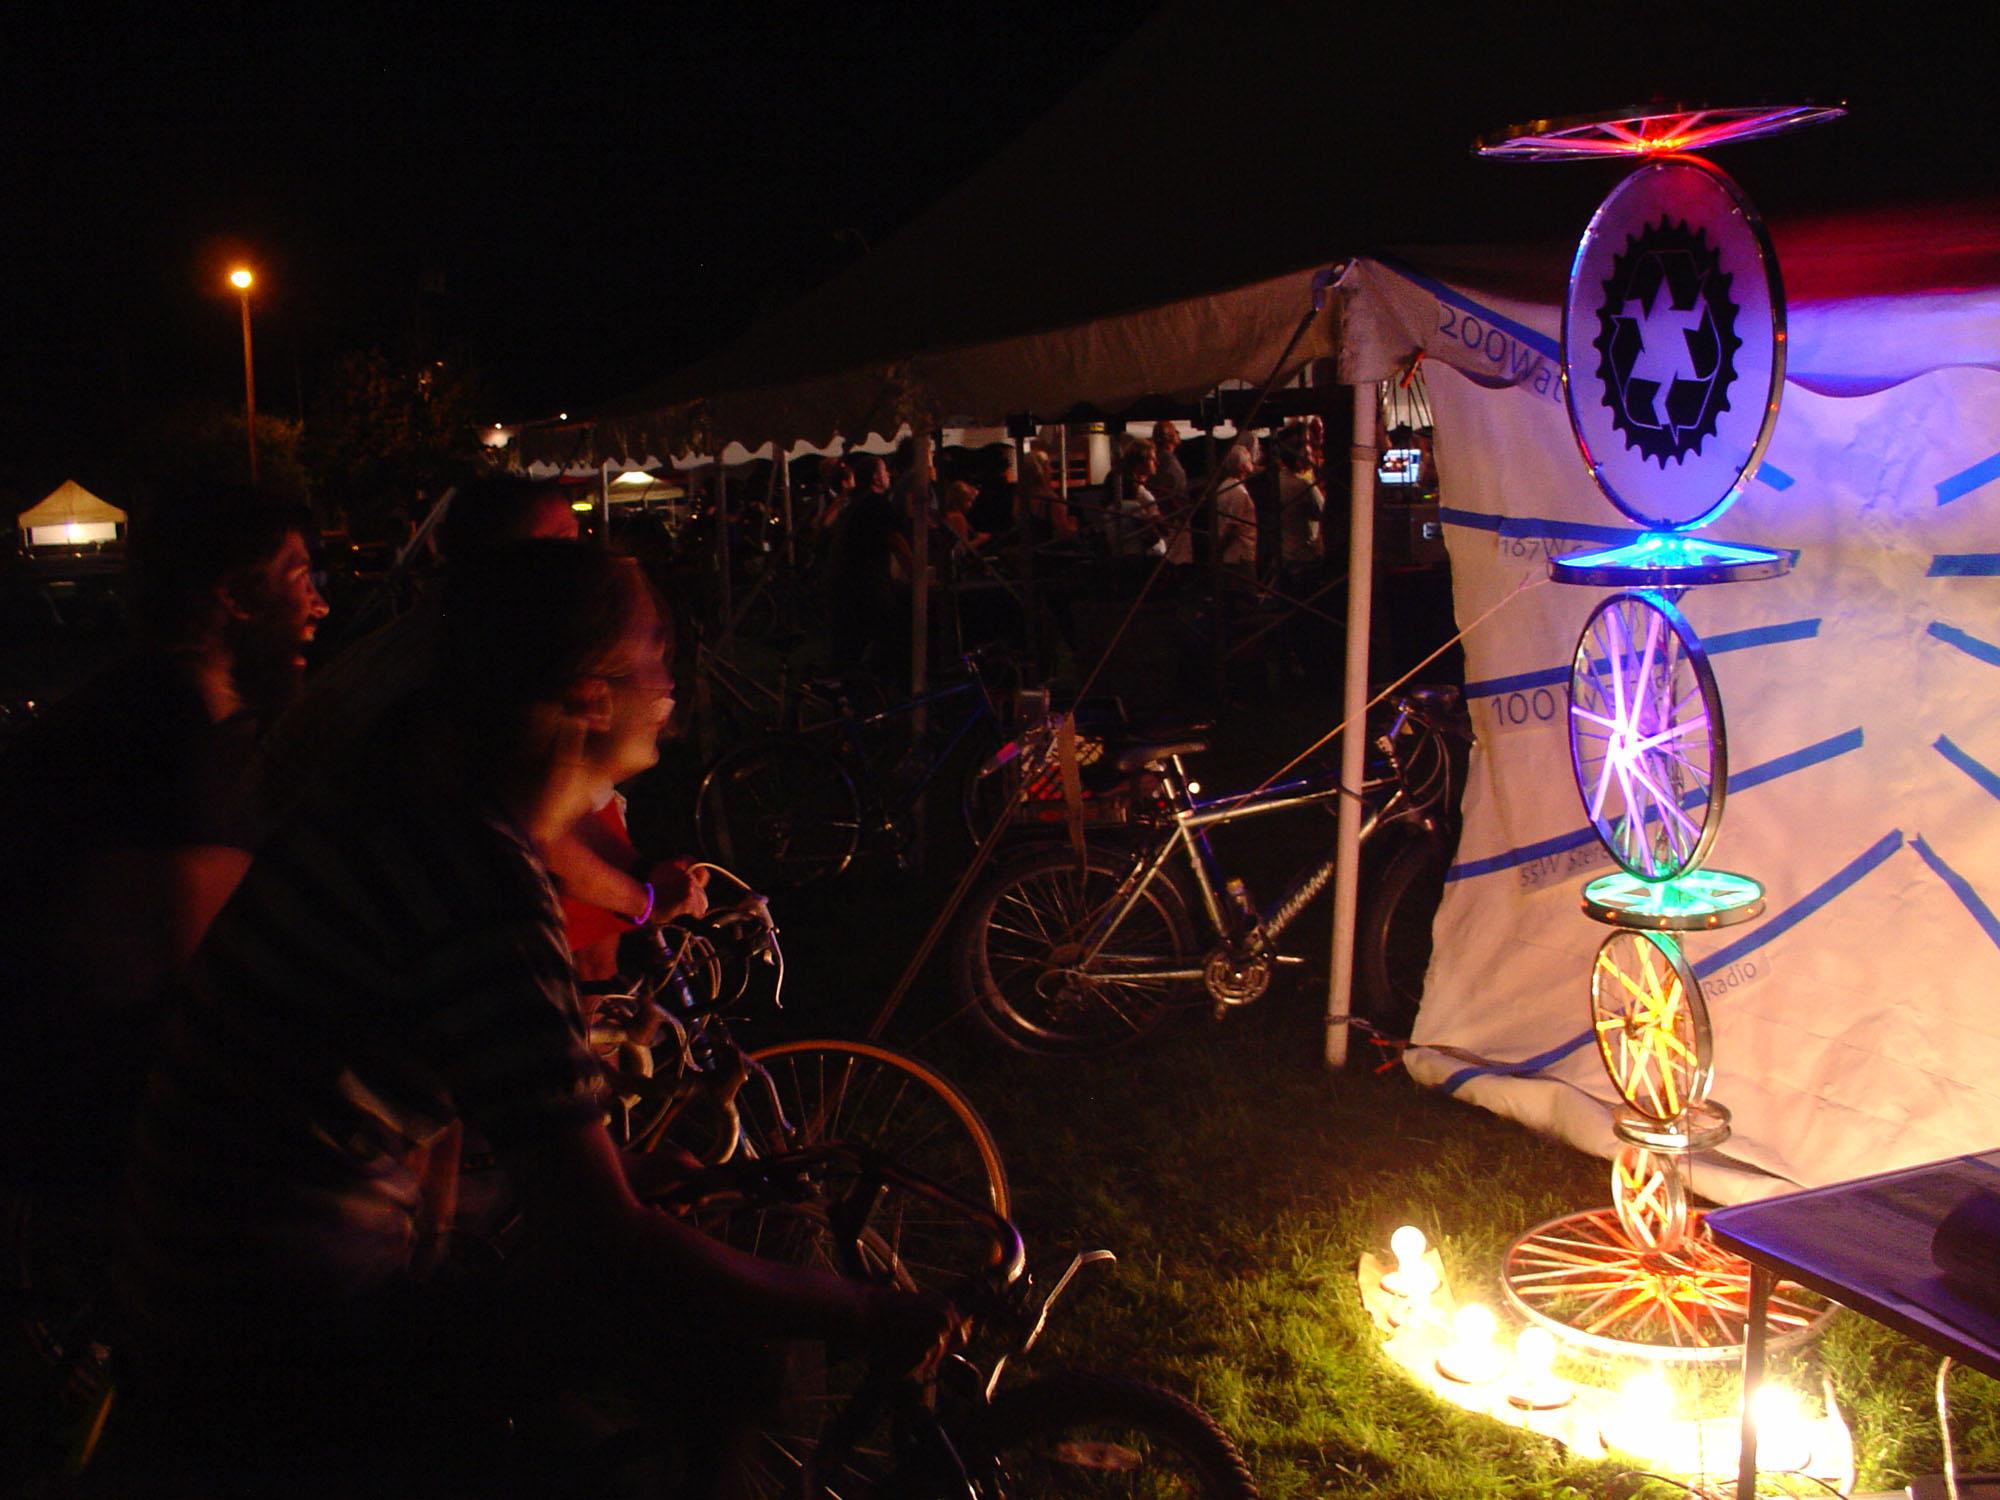 CycletheTowerofPowerb.jpg